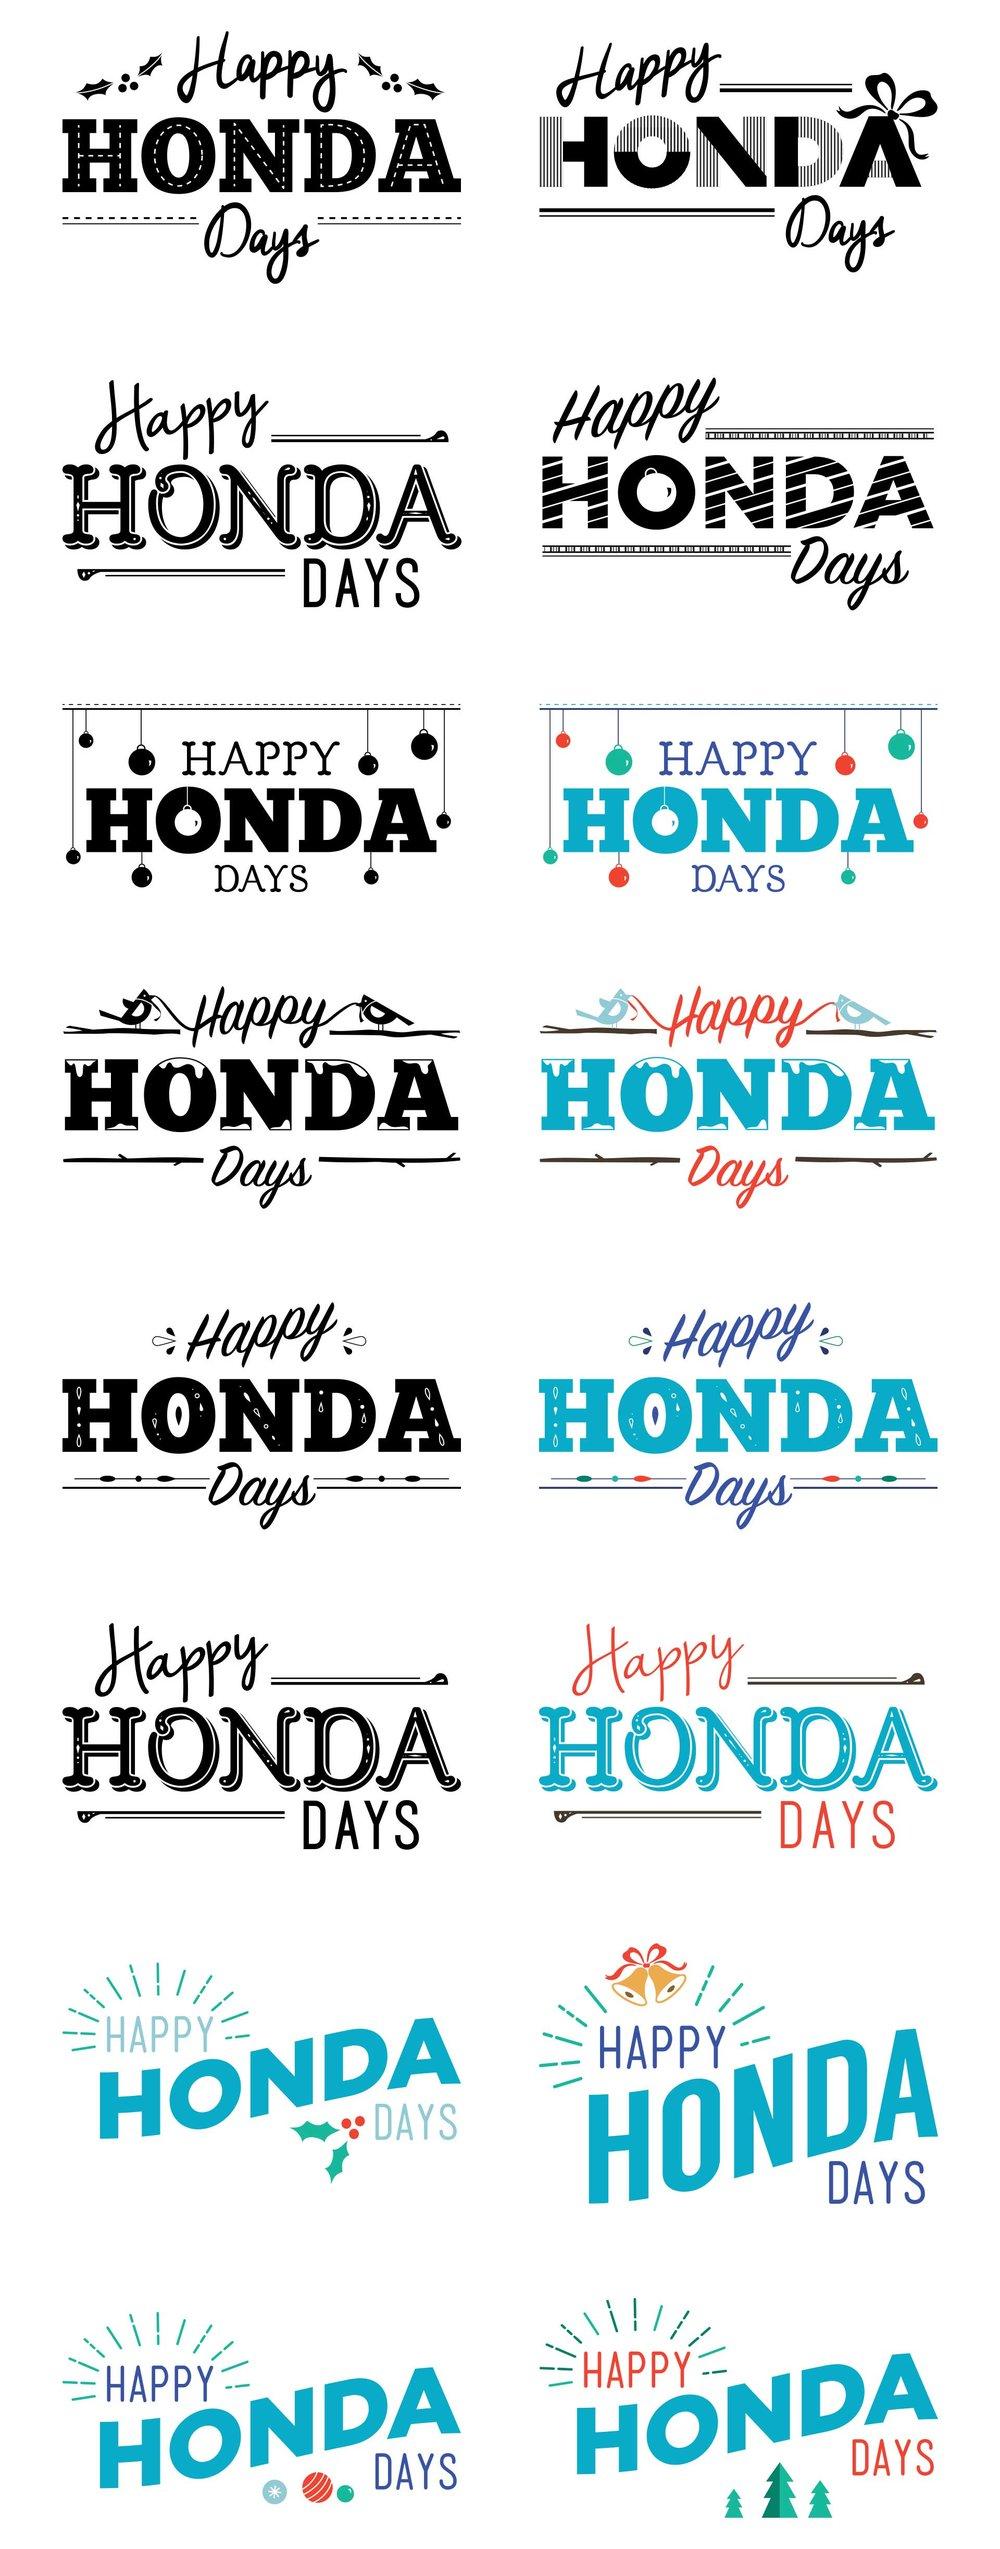 Honda_03.jpg